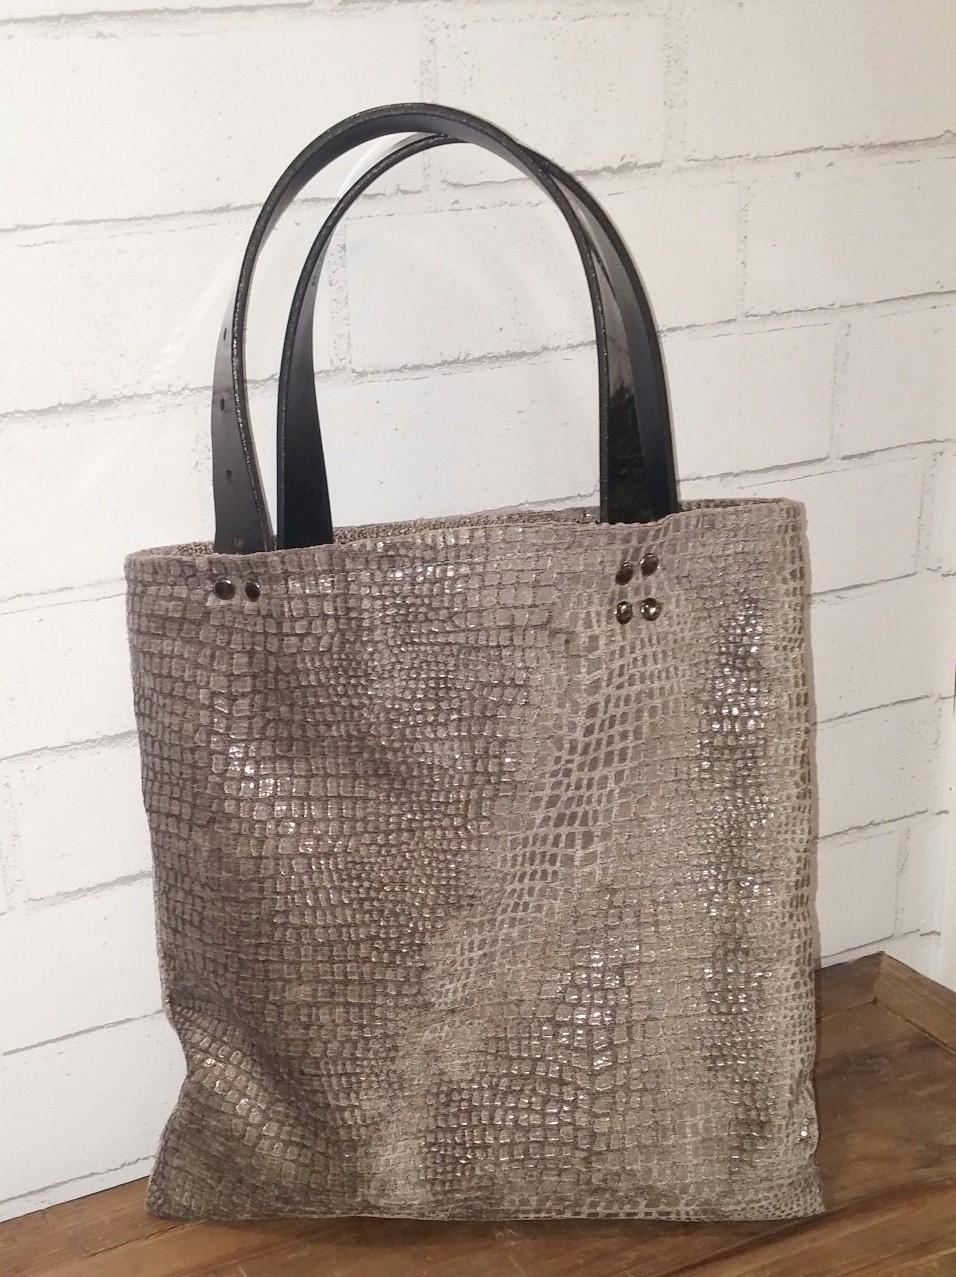 grumpy bags town tote glitzy animal print.jpg